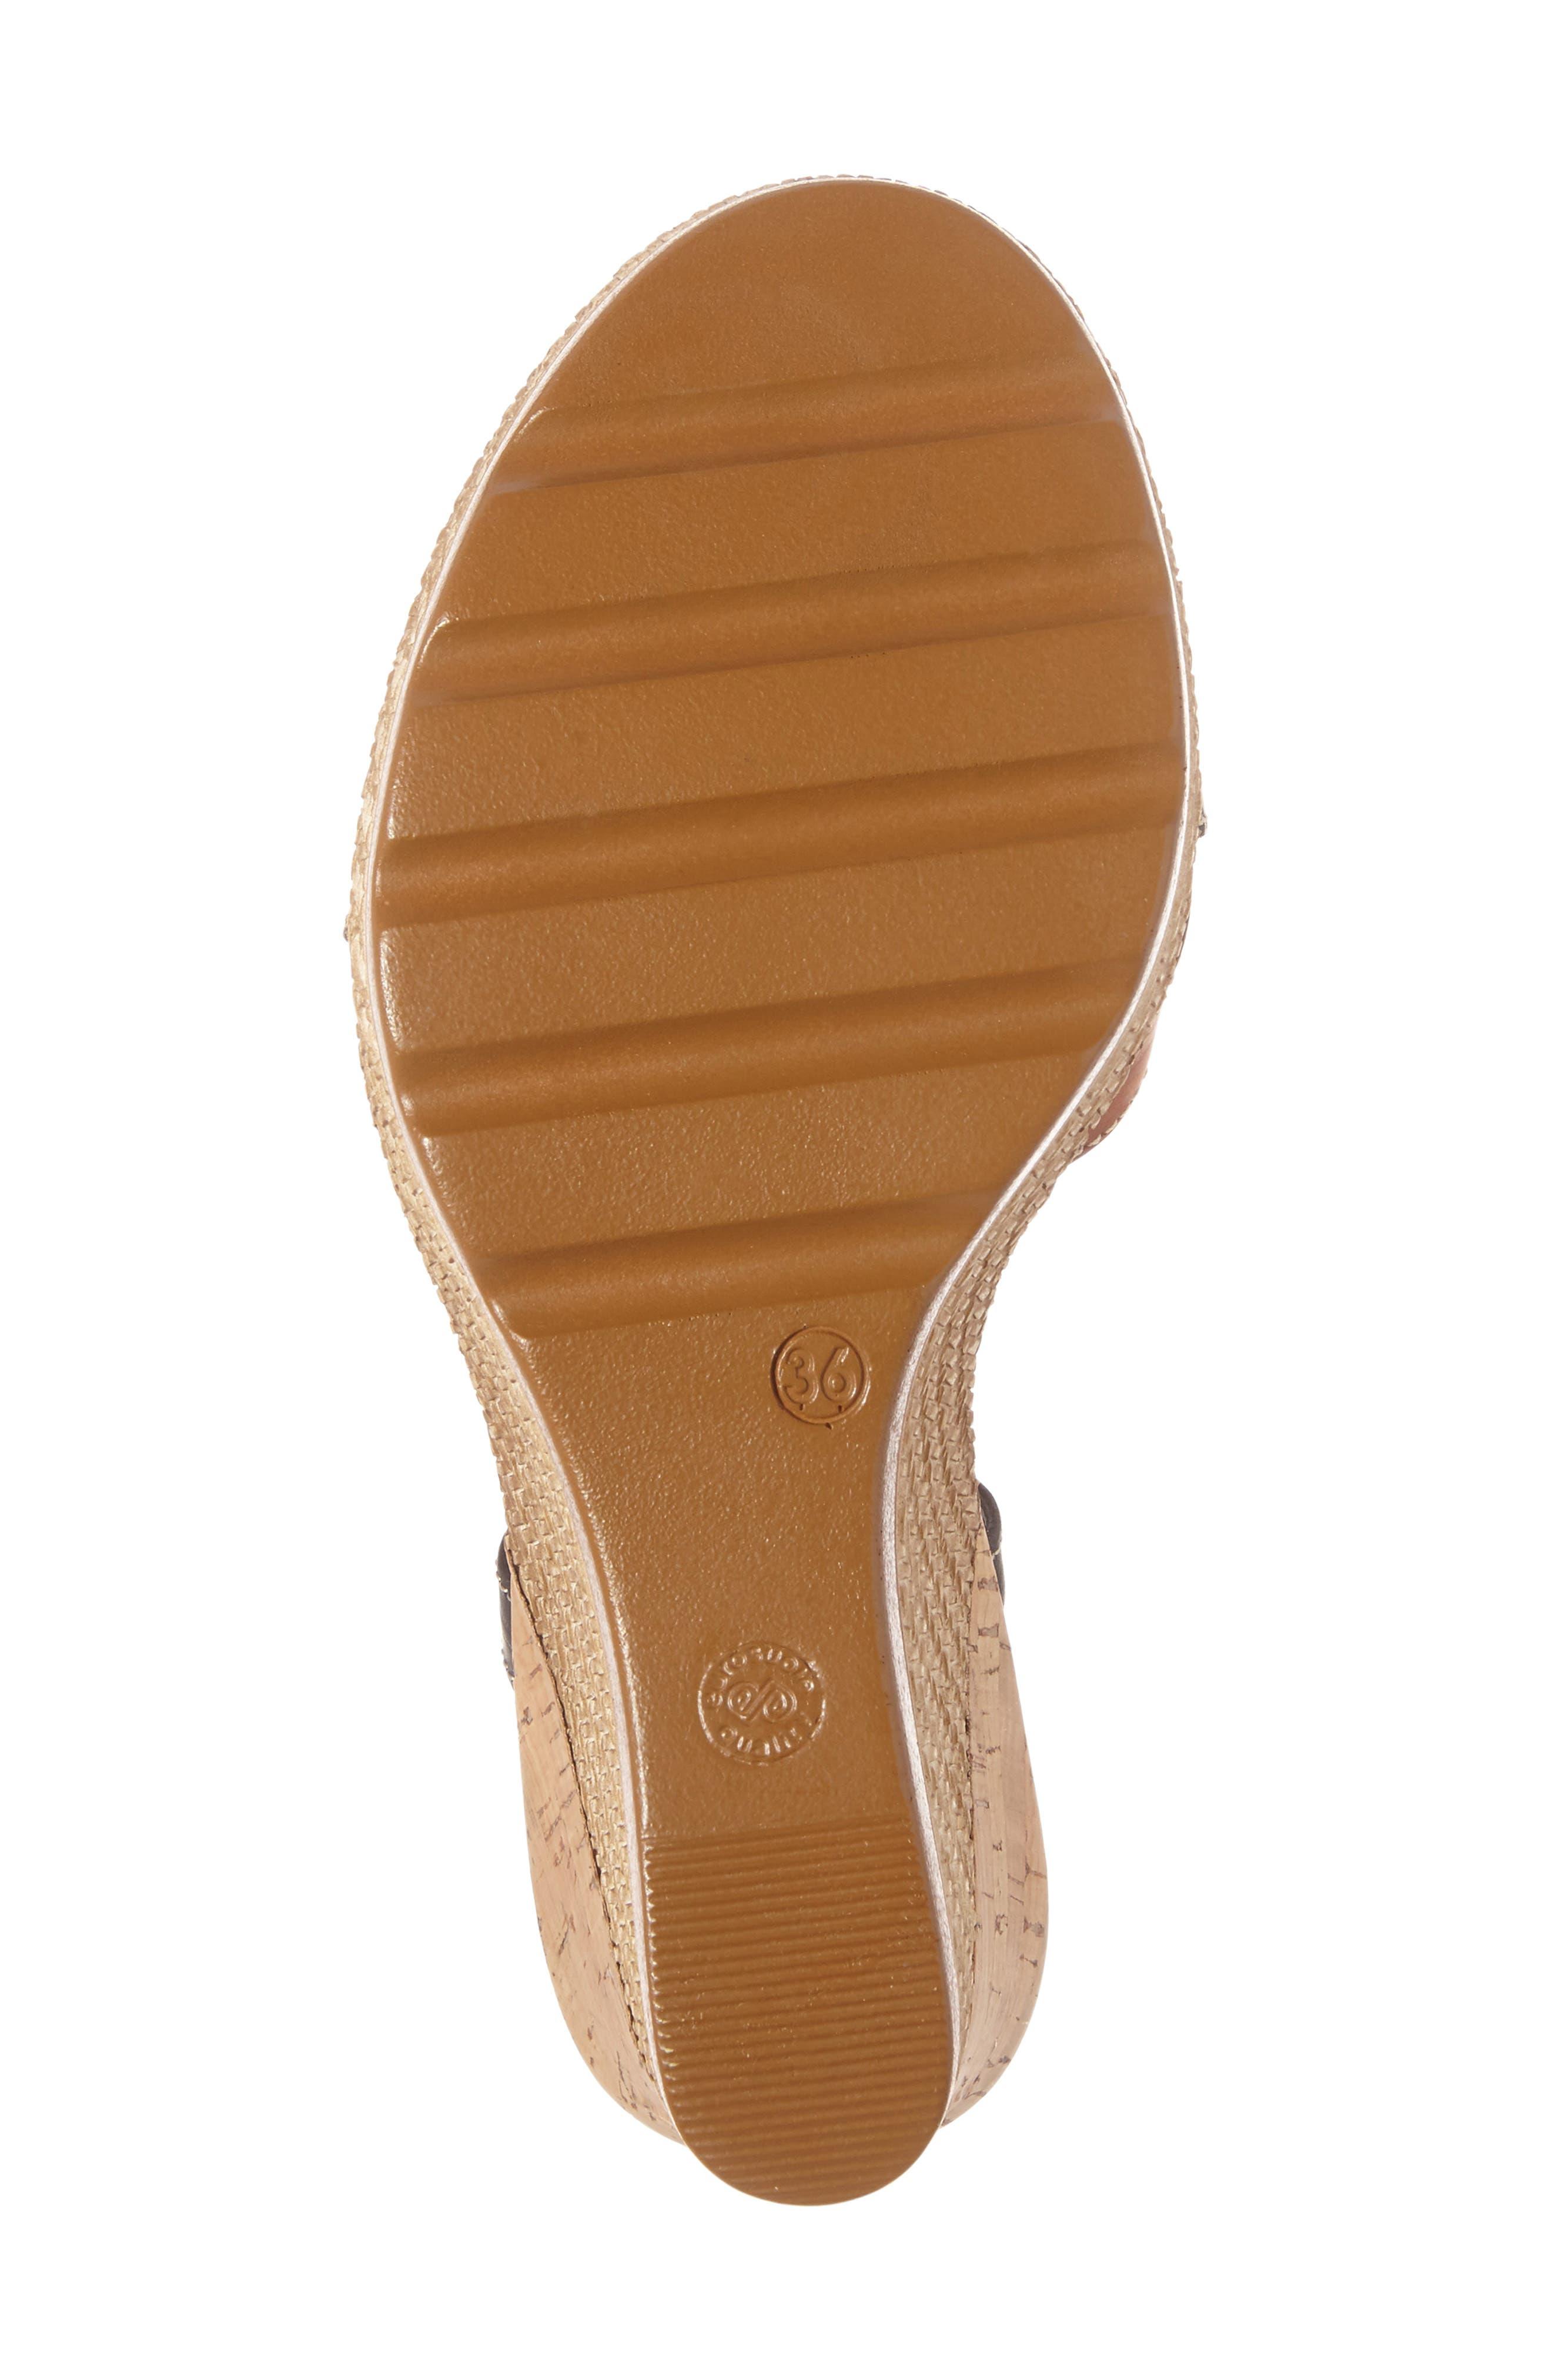 Modena Wedge Sandal,                             Alternate thumbnail 4, color,                             001